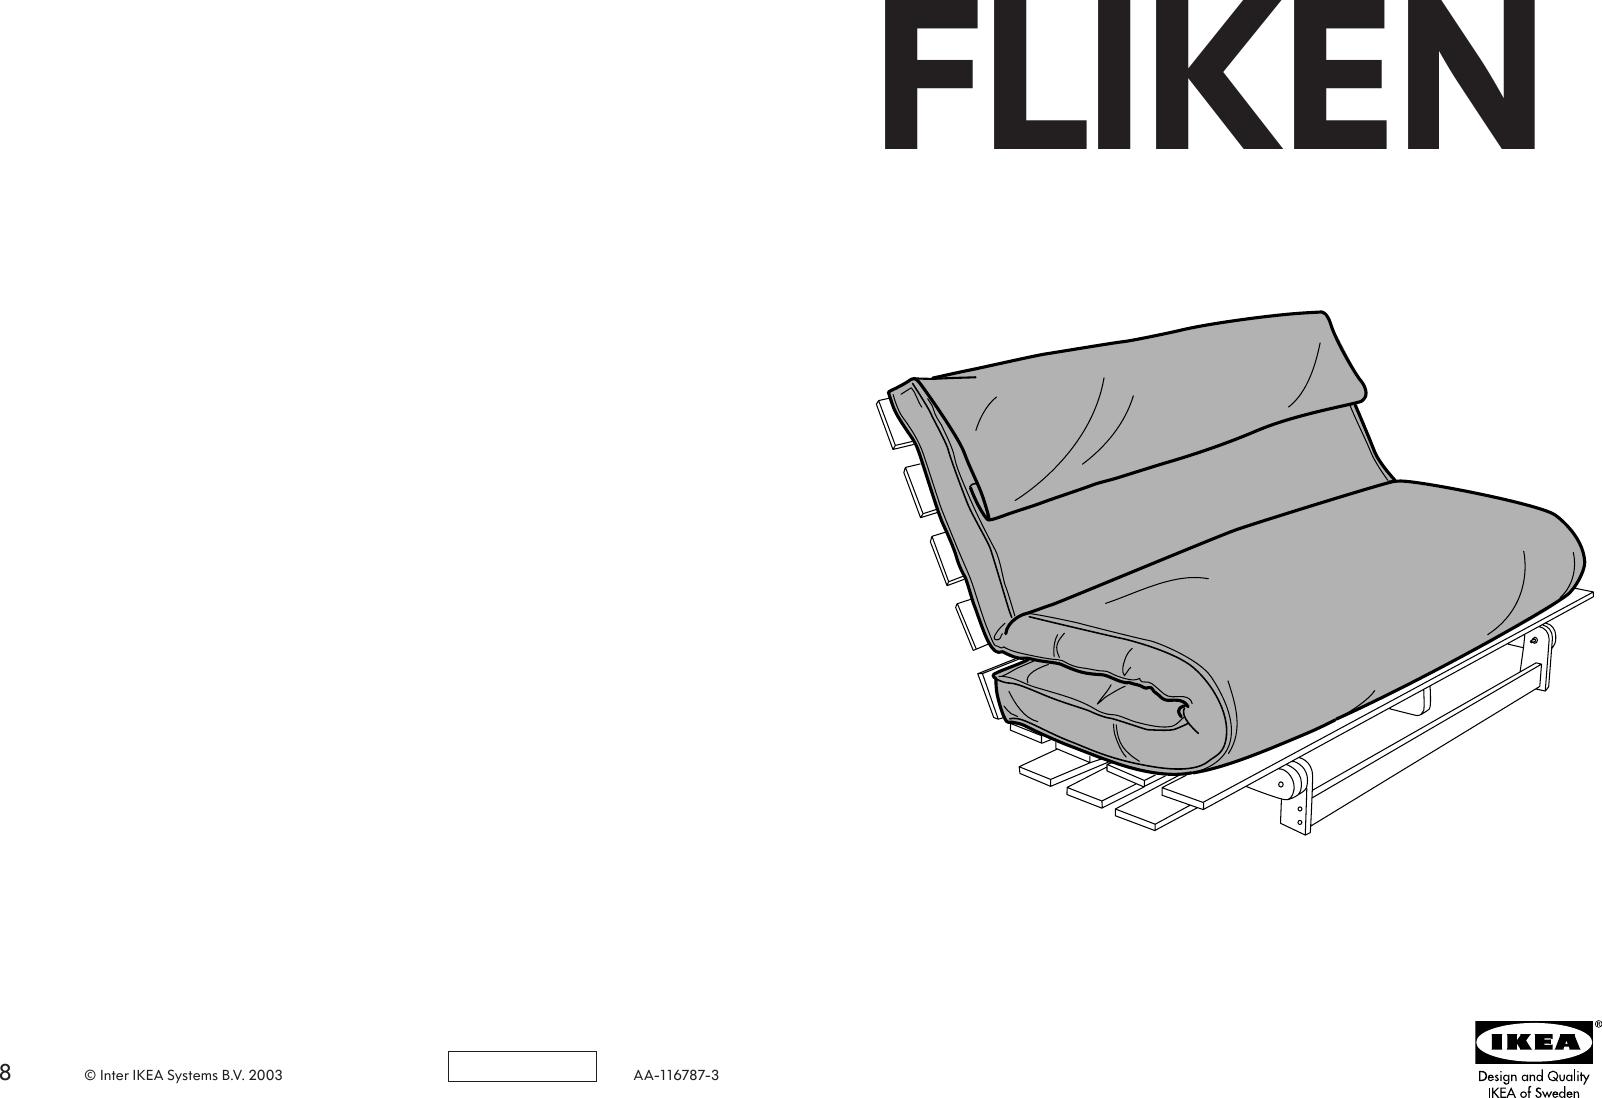 ikea friheten sofa bed embly instructions stockholm usa futon